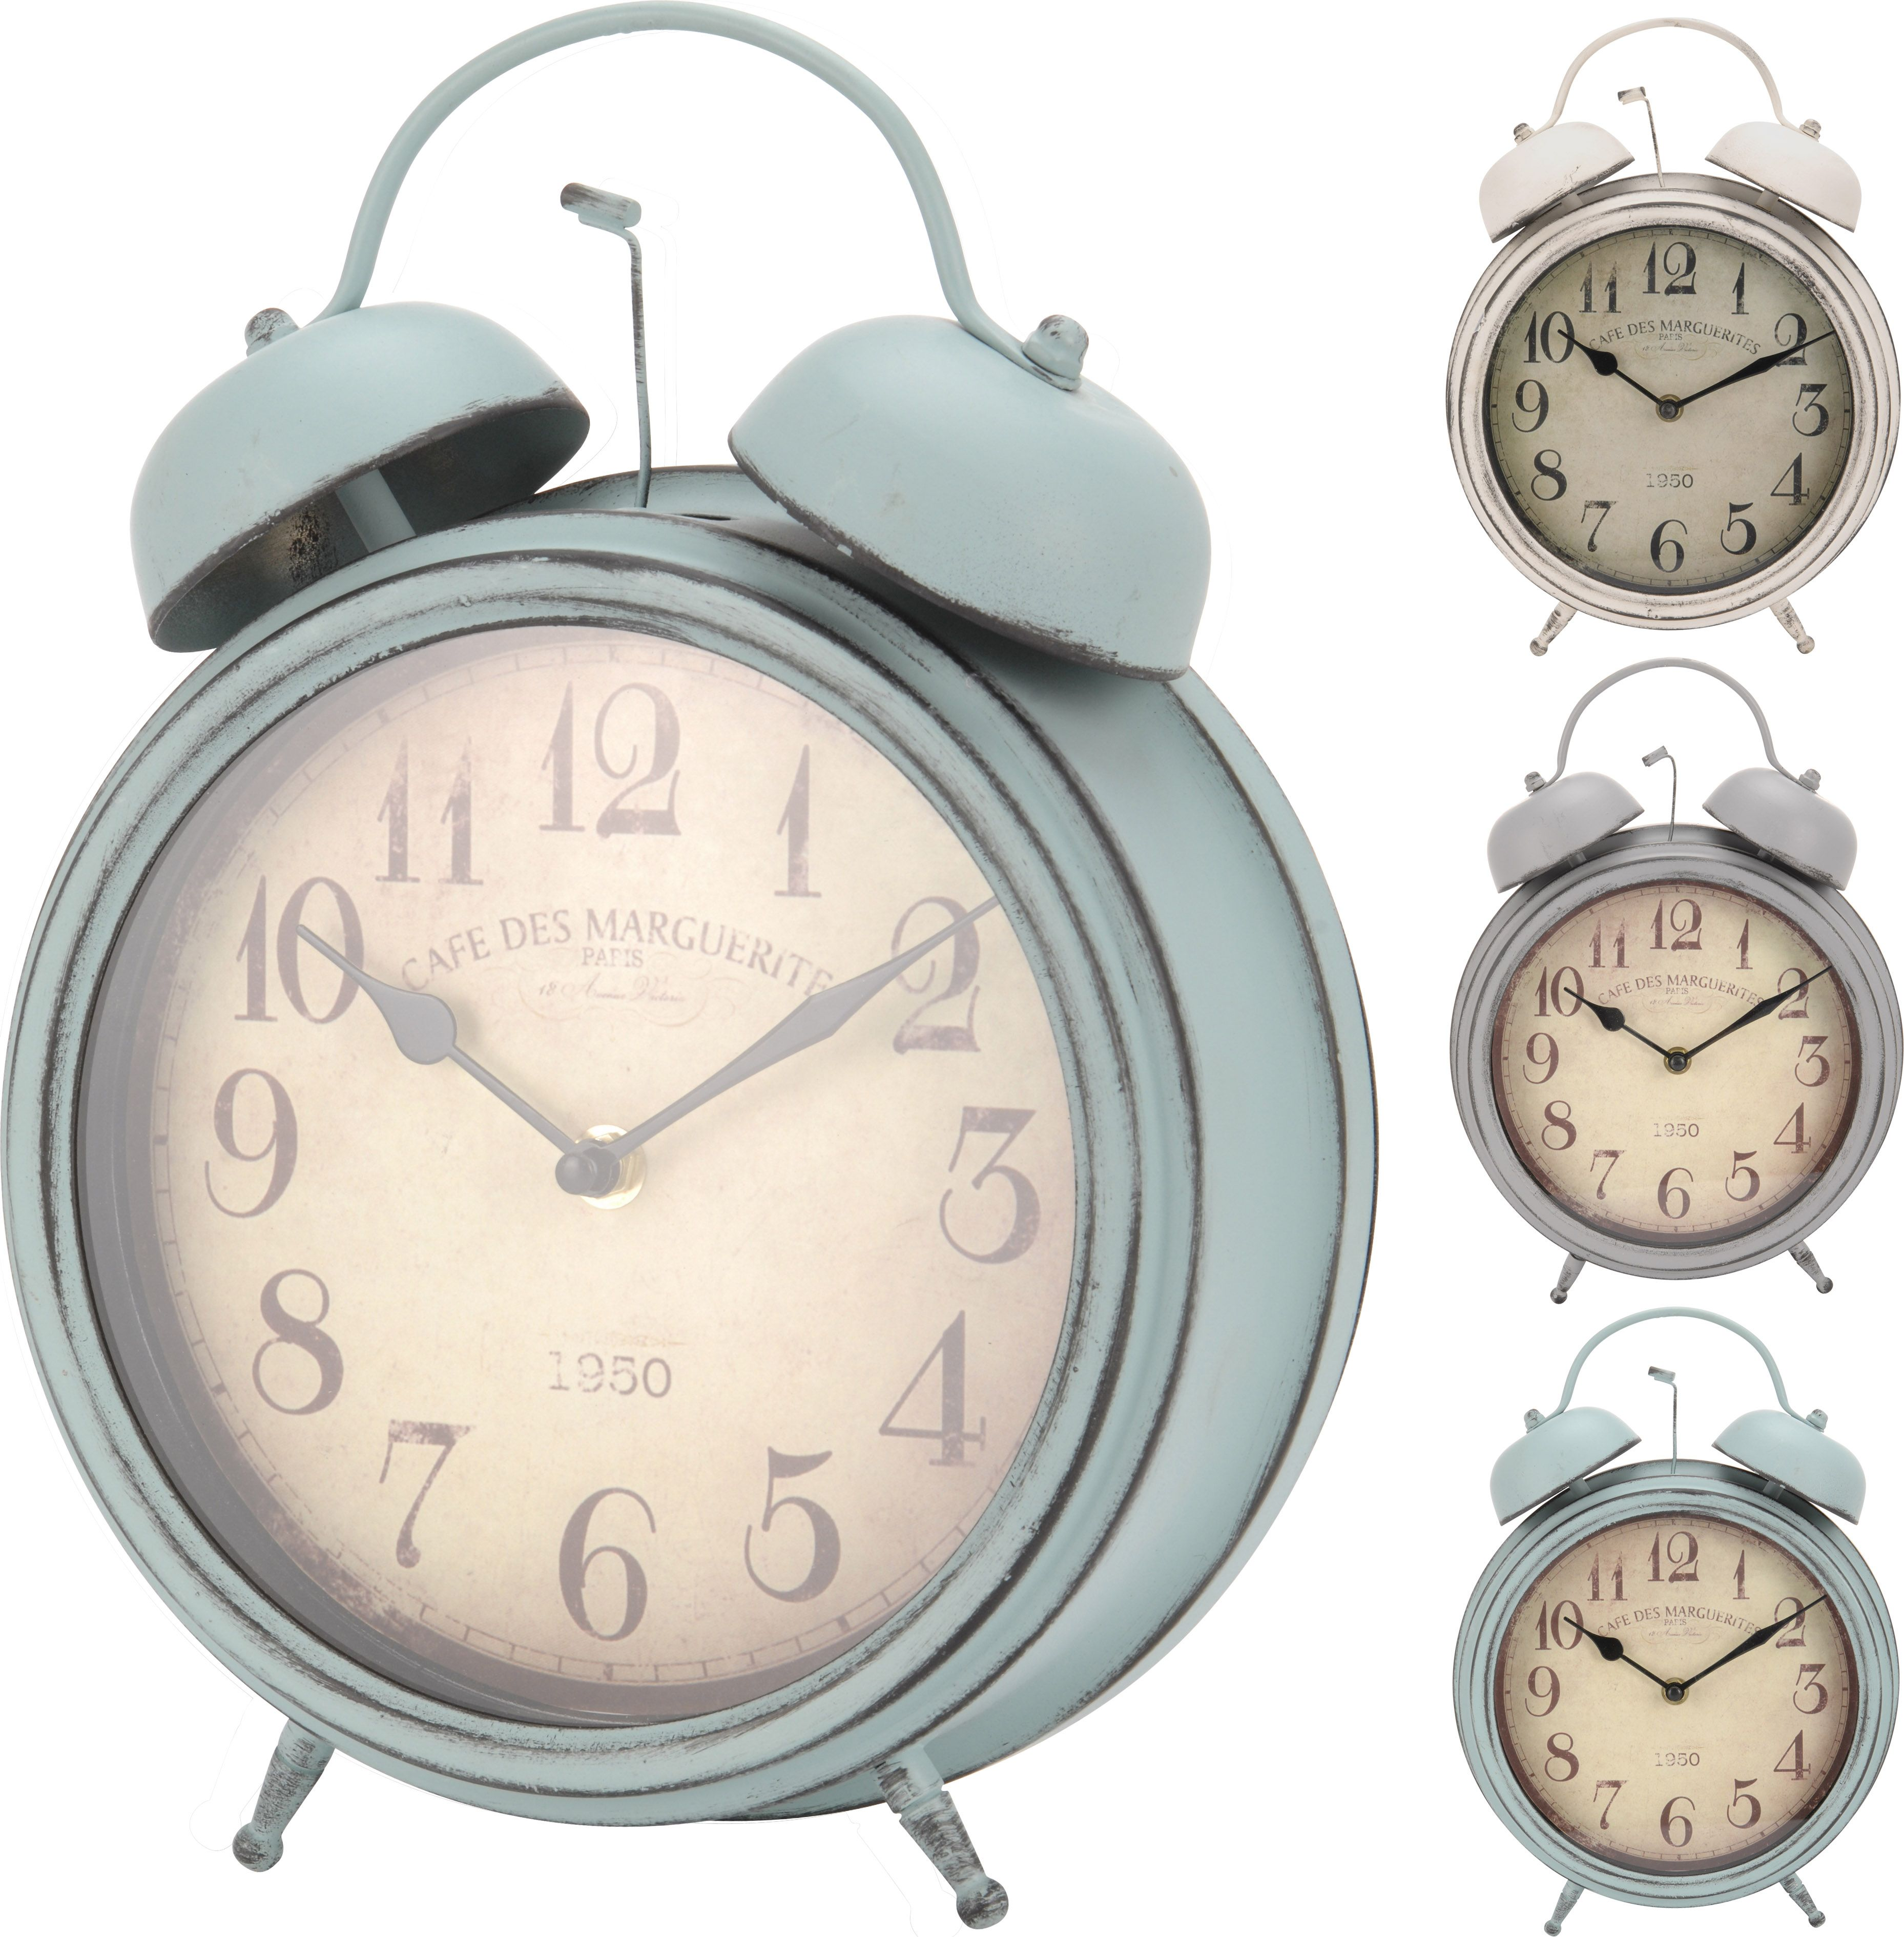 Good CLEARANCE SALE Vintage Retro Alarm Clock Effect Quartz Mantelpiece Free  Standing Table Clocks